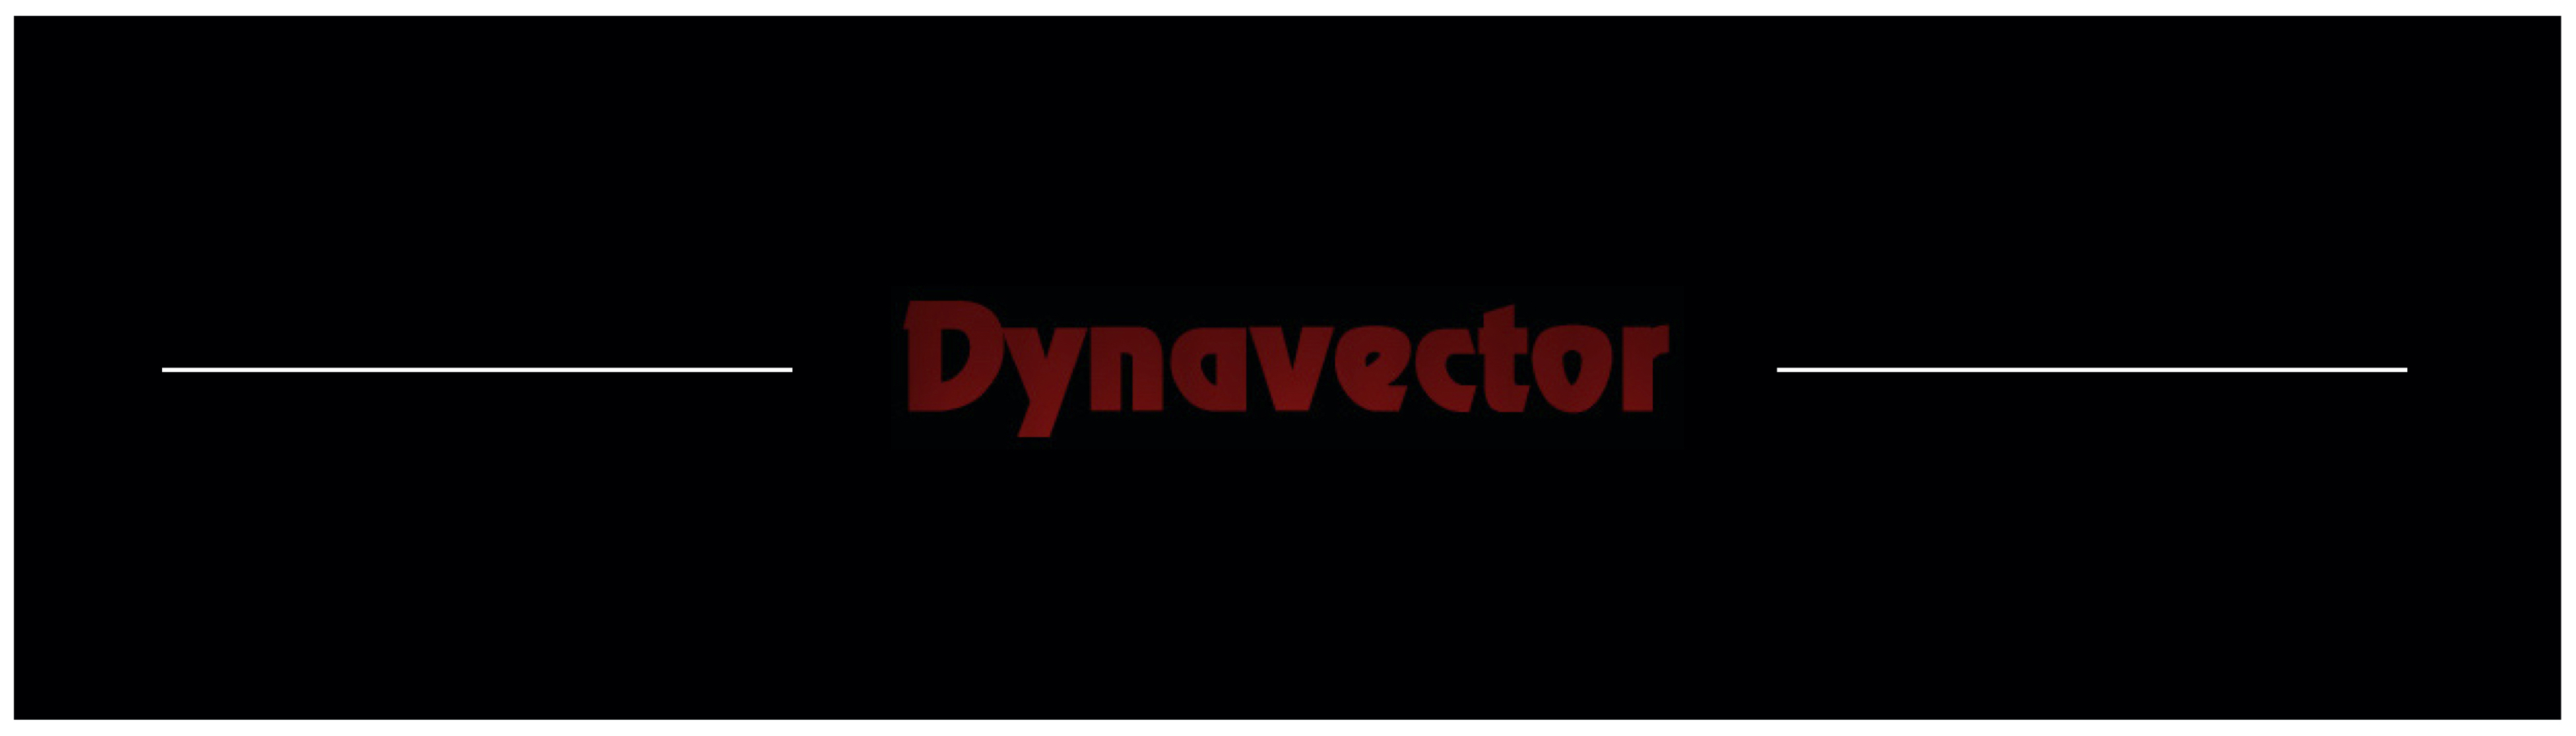 dynavector-logo.jpg